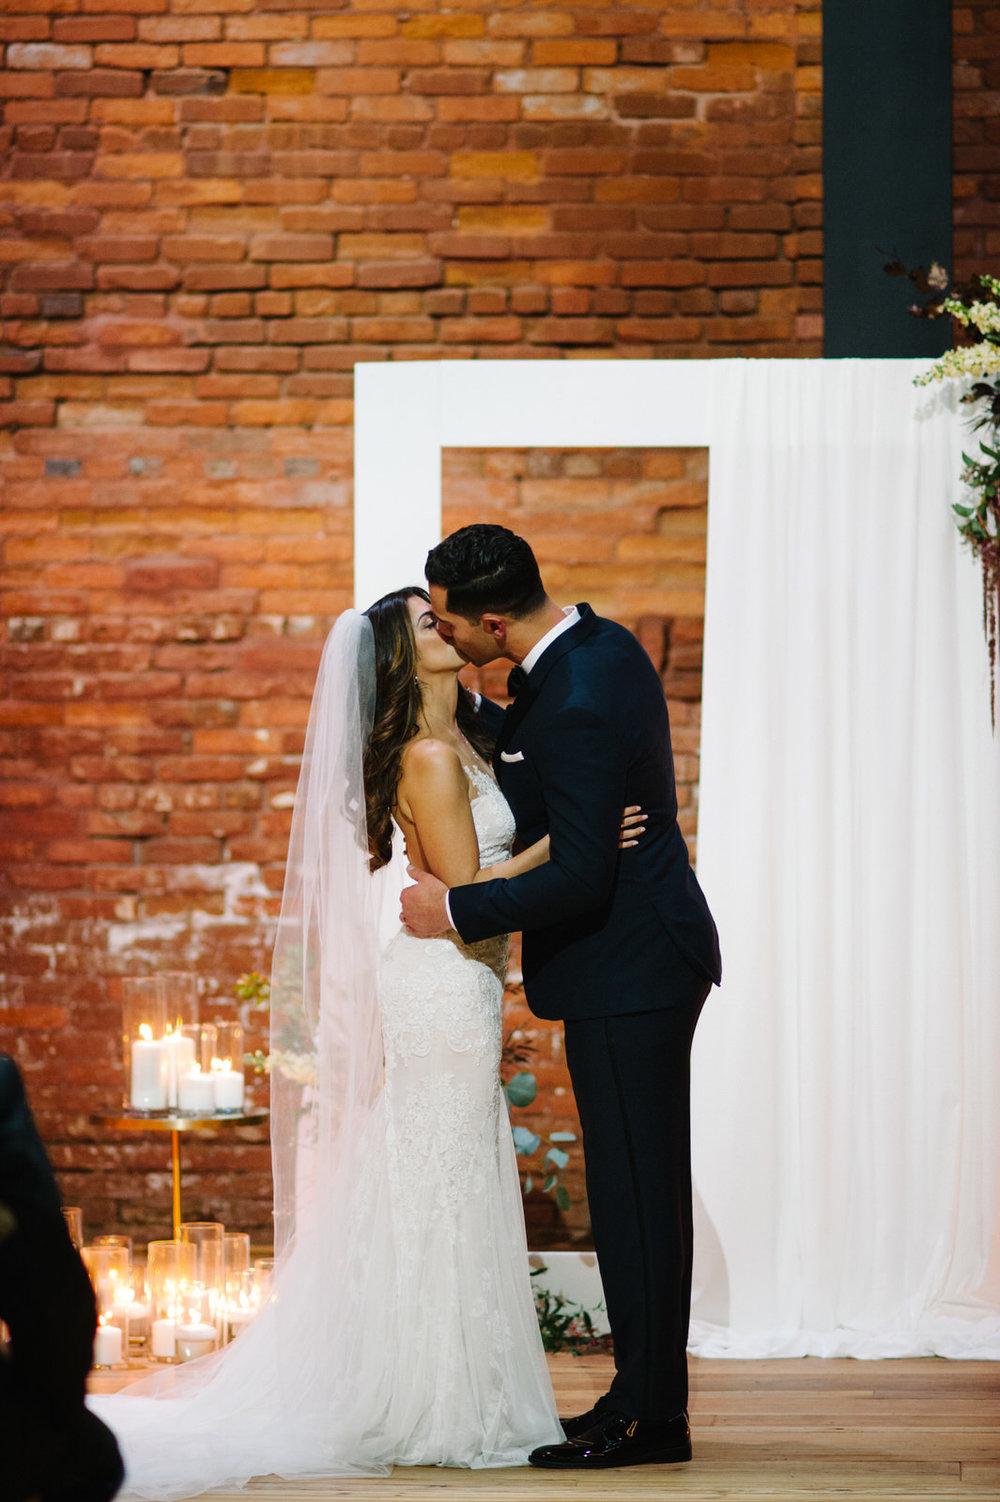 Bride and Groom Wedding Kiss Armature Works Tampa